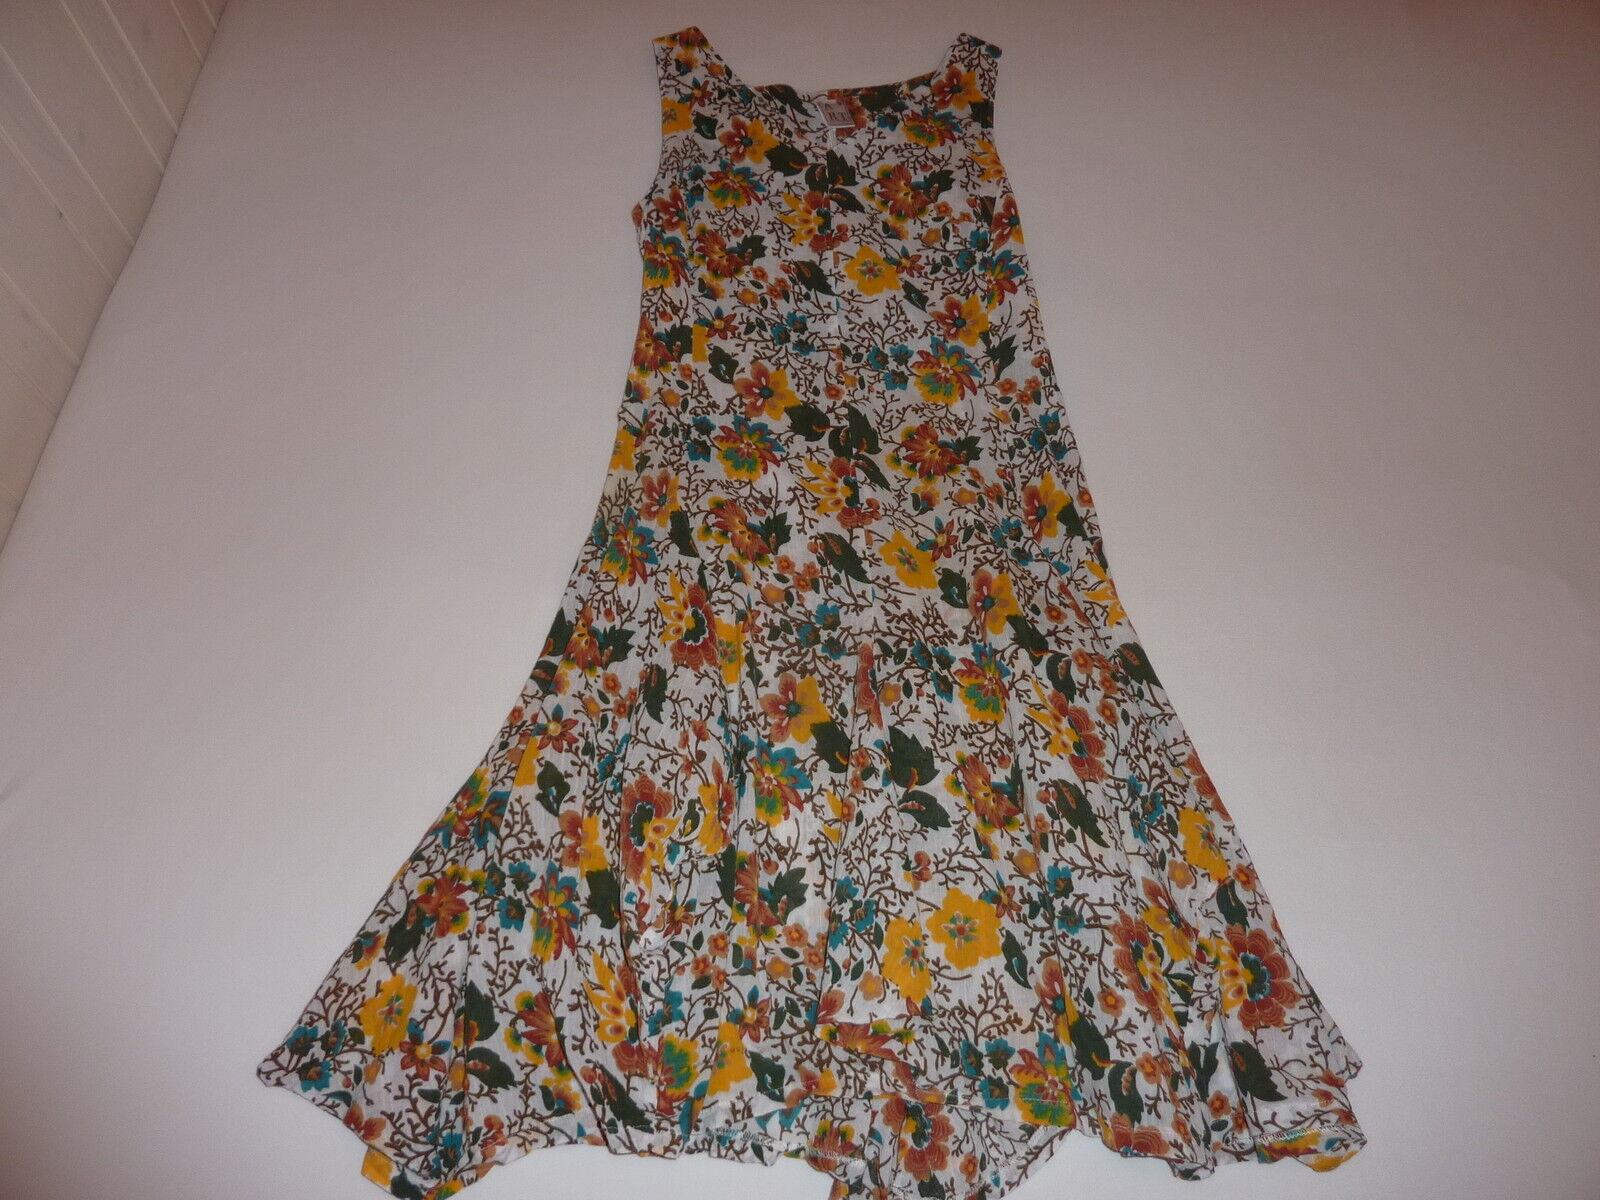 Atelier Rare Toggery Sommerkleid mit Bolero Jacke (Größe  S, Farbe  mehrfarbig)